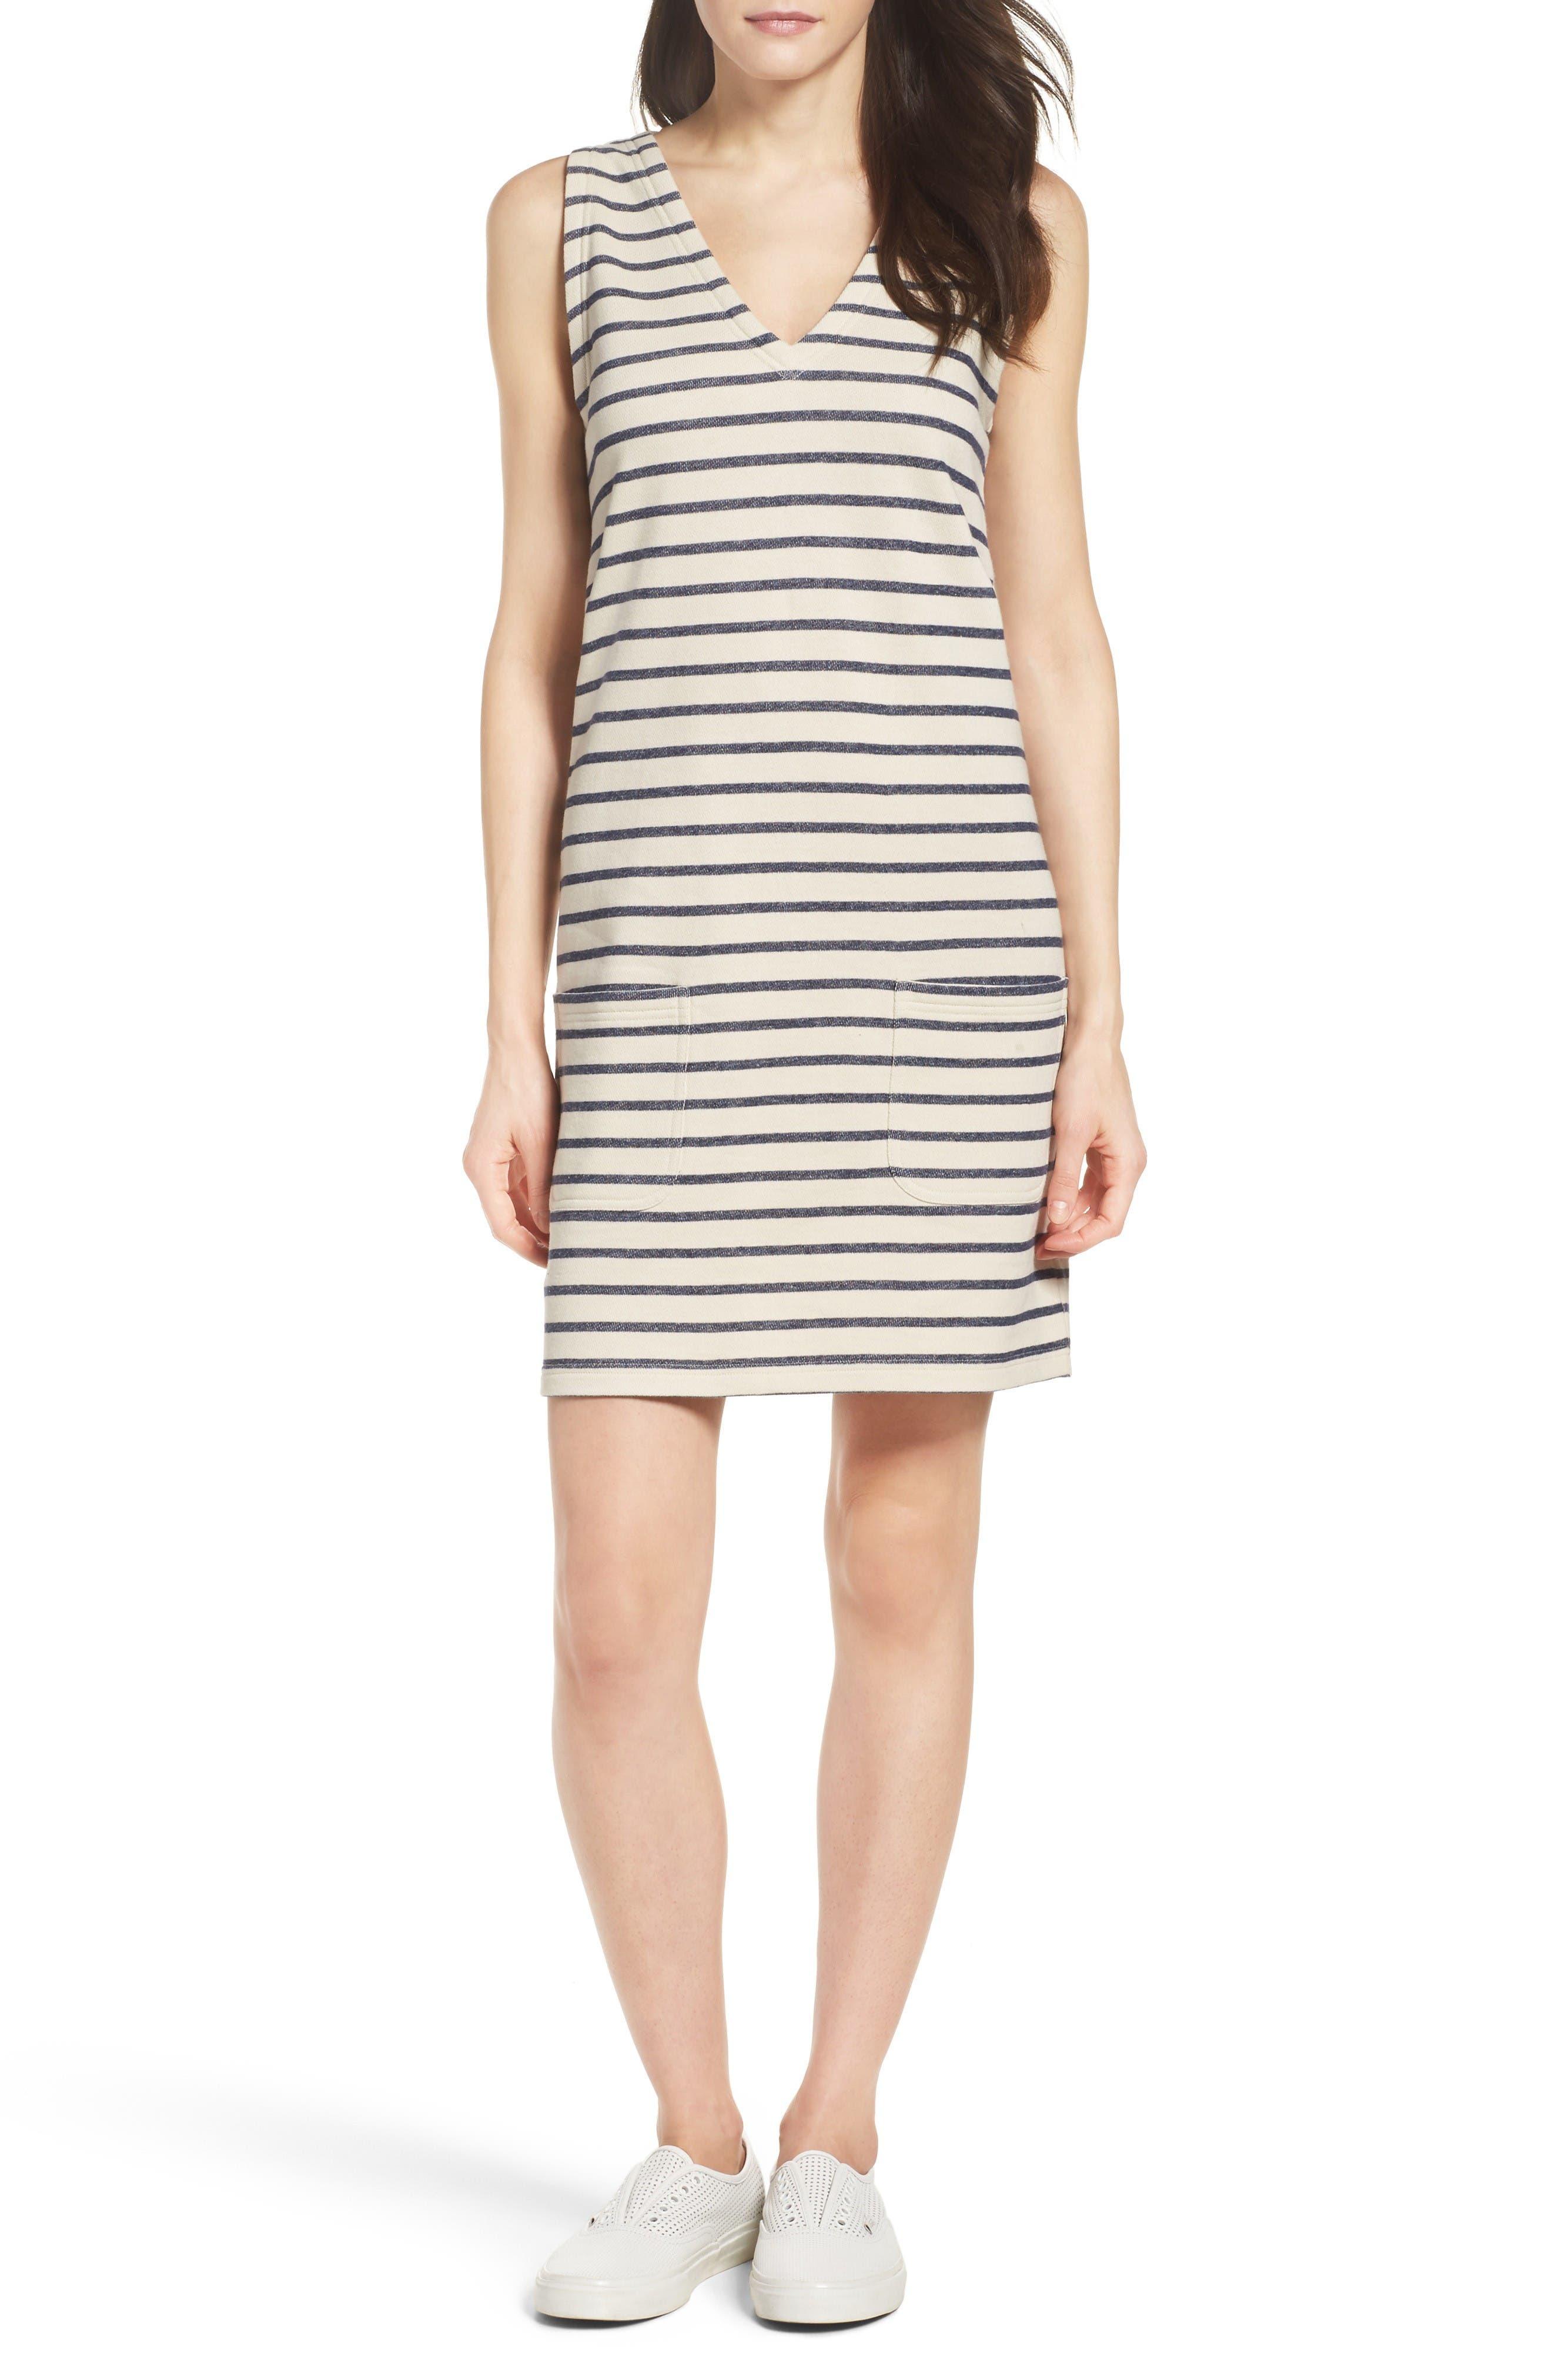 Normandy Stripe Dress,                             Alternate thumbnail 4, color,                             Brule/ Indigo